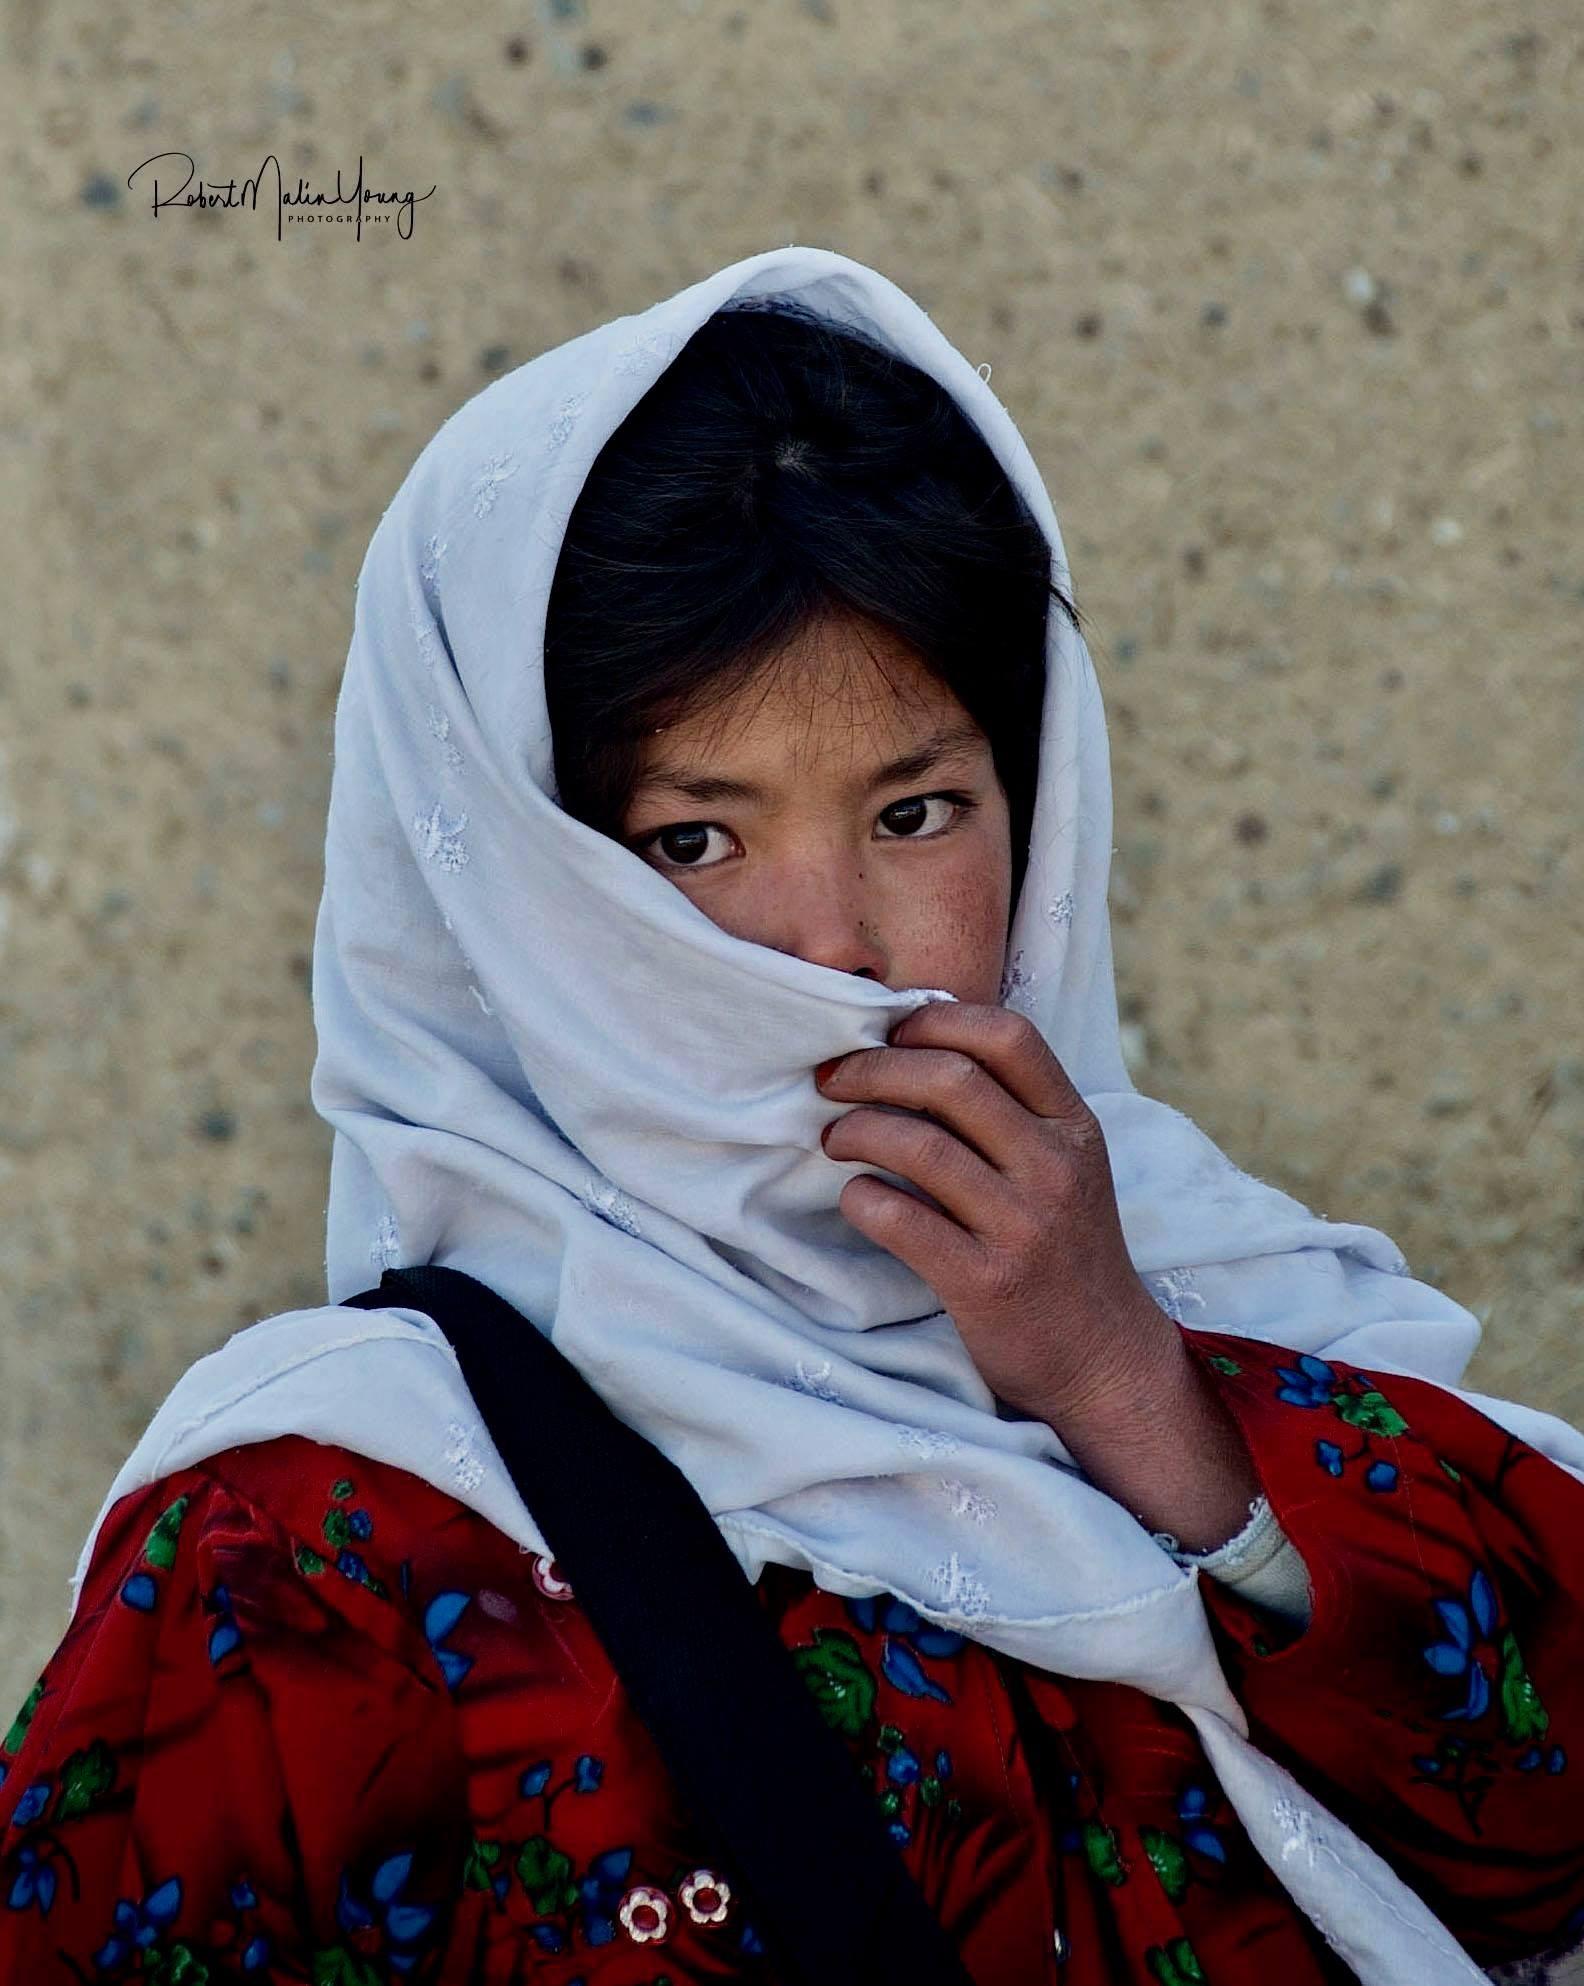 Hazari girl - Bamiyan Afghanistan 2018 by Robert Malin Young